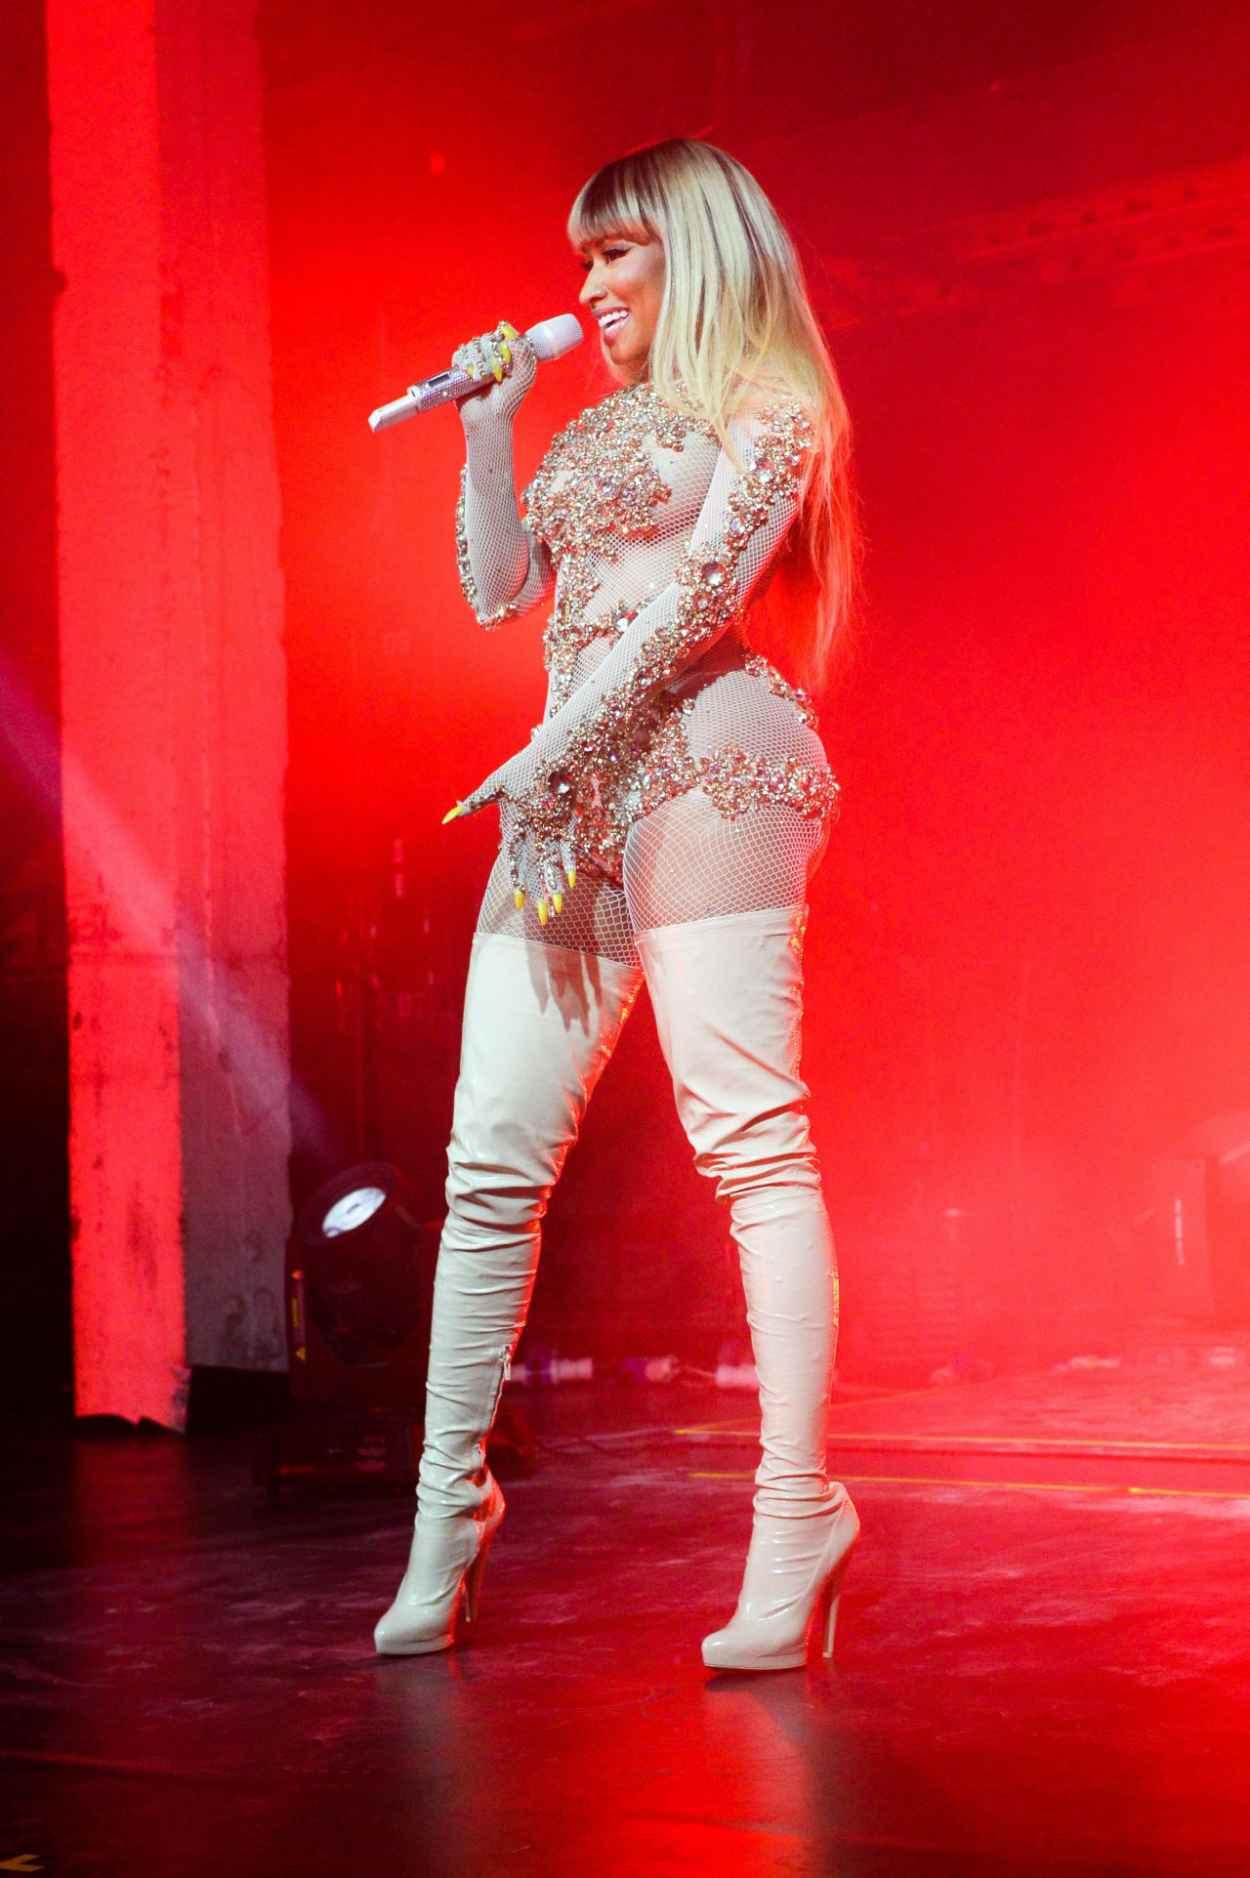 Nicki Minaj - Preforming at the Givenchy Party - Milan Fashion Week S/S 2016-4